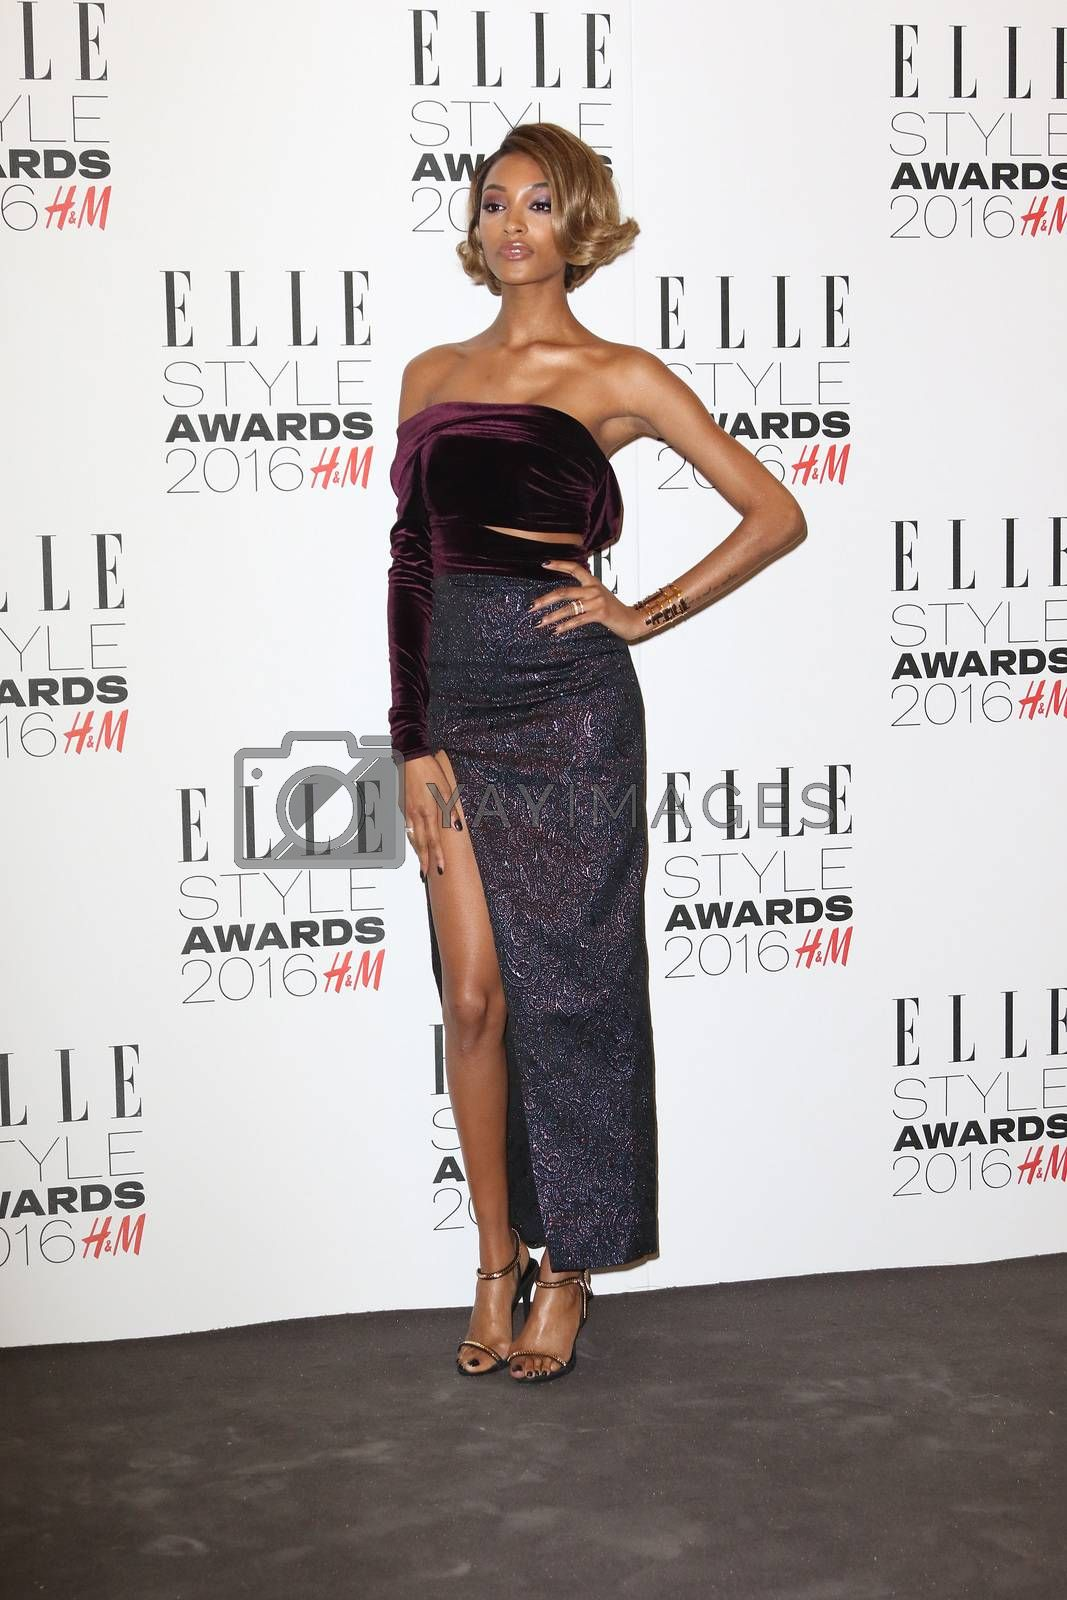 UK, London: British model Jourdan Dunn poses on the red carpet of the Elle Style Awards in London on February 23, 2016.